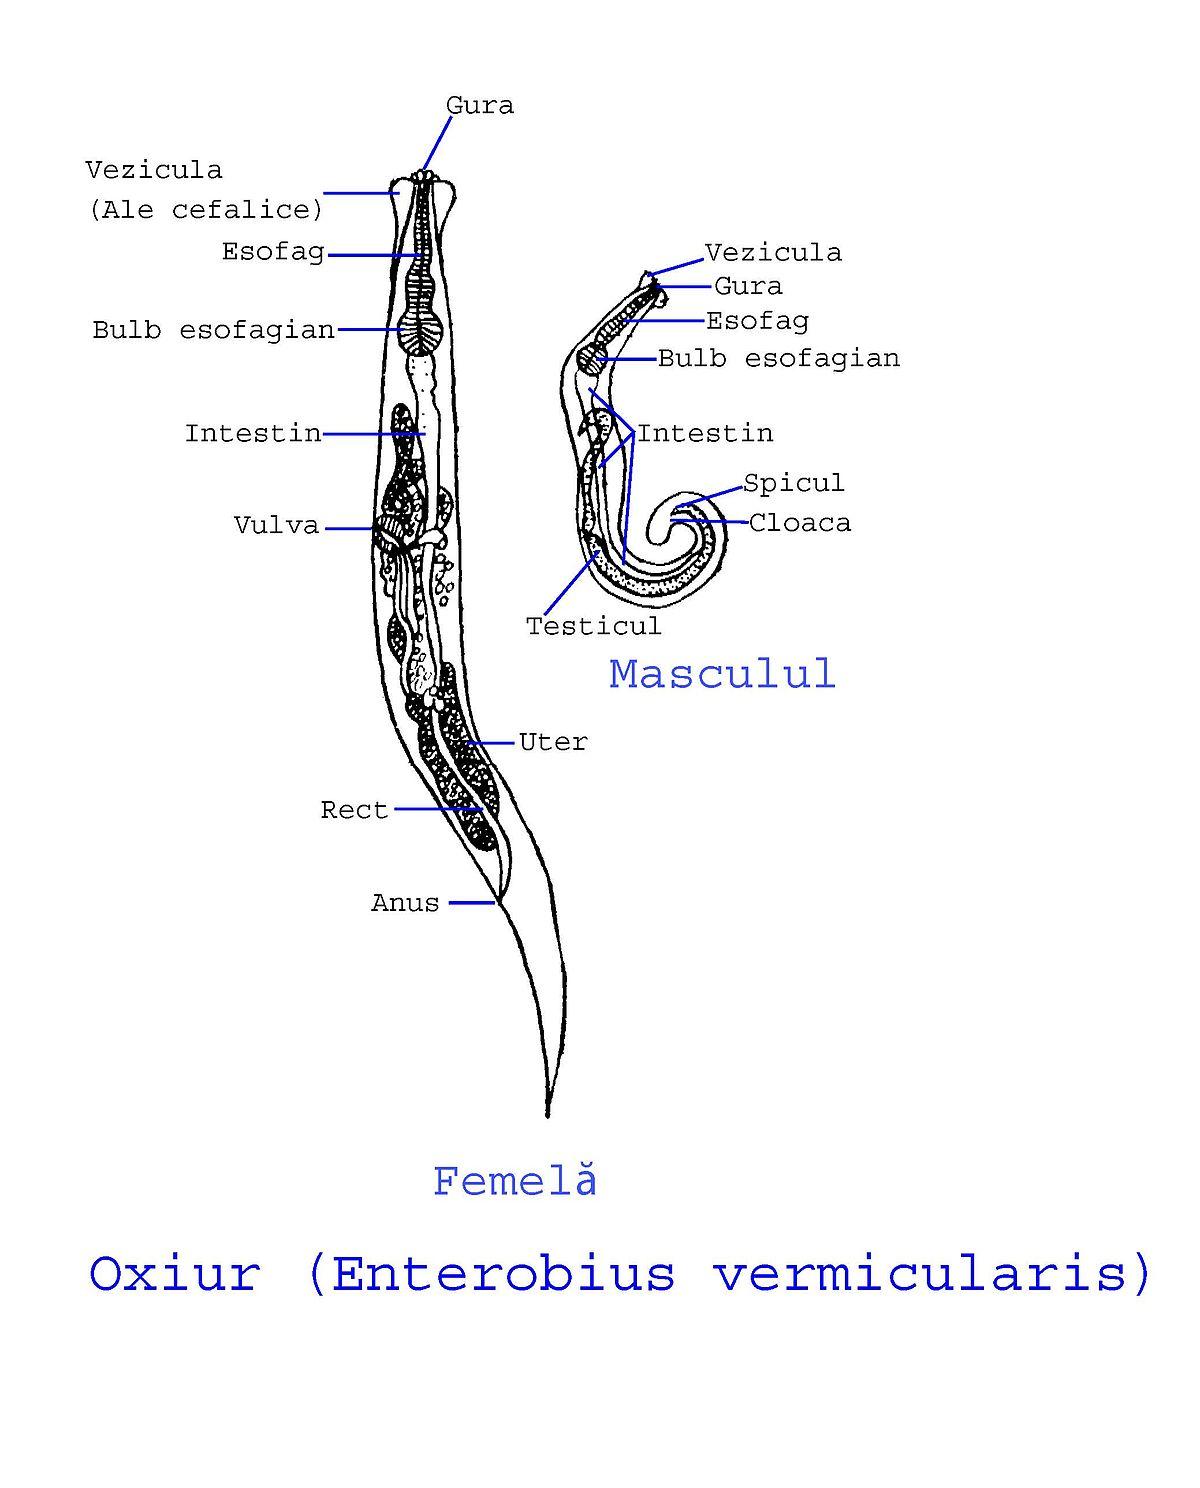 Verme oxiurus pode matar, Verme oxiurus nas fezes - eng2ro.ro